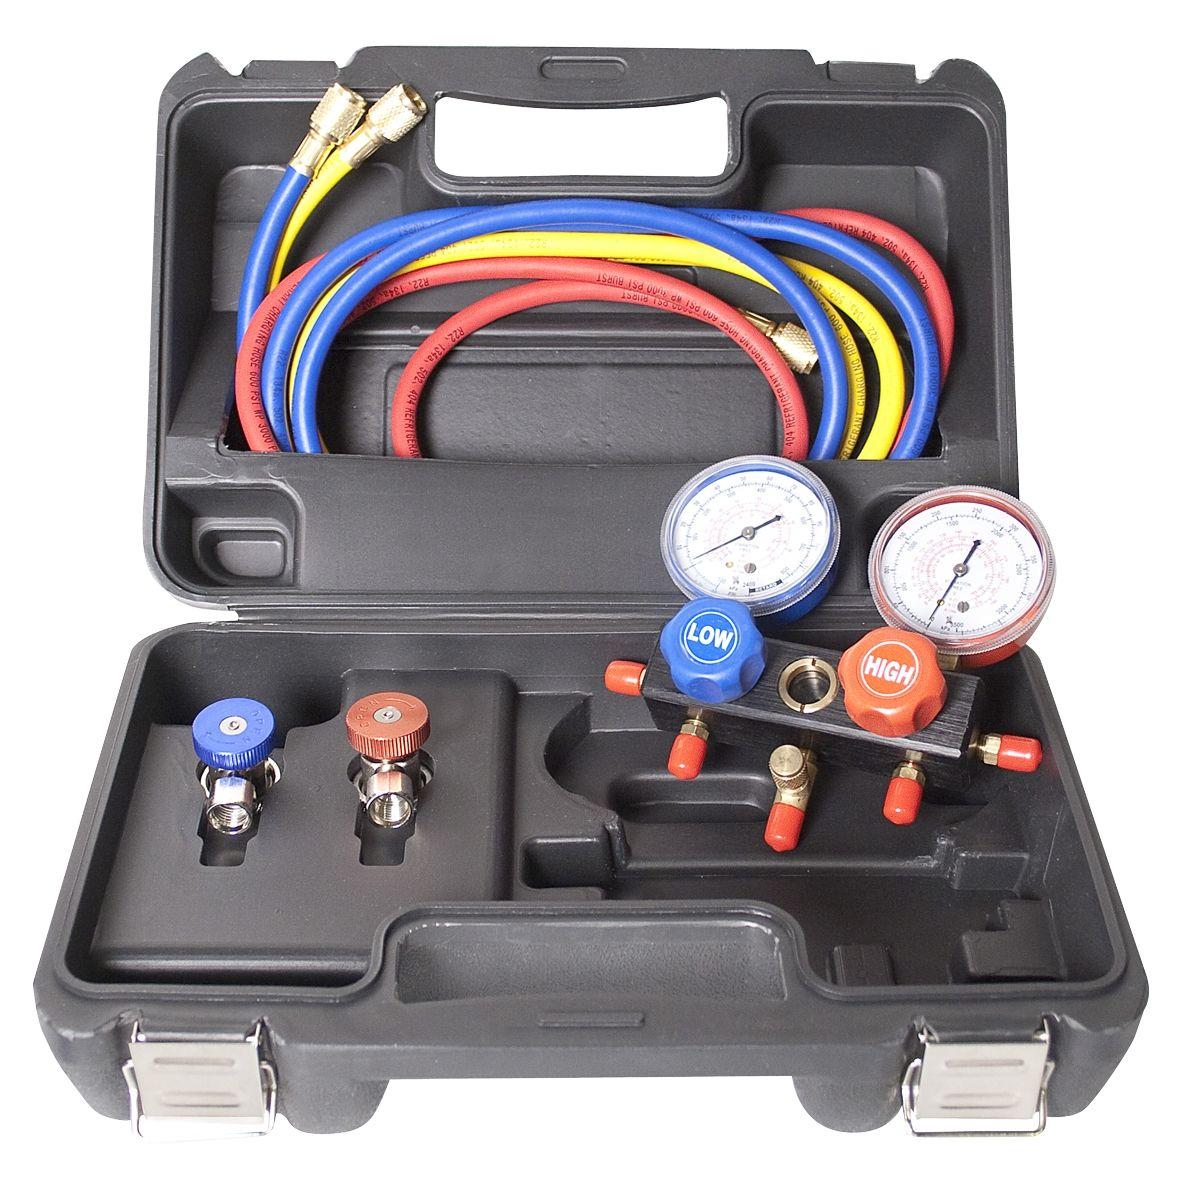 Electronic Auto Gauge Set : Reviews r a aluminum block manifold gauge set w manual